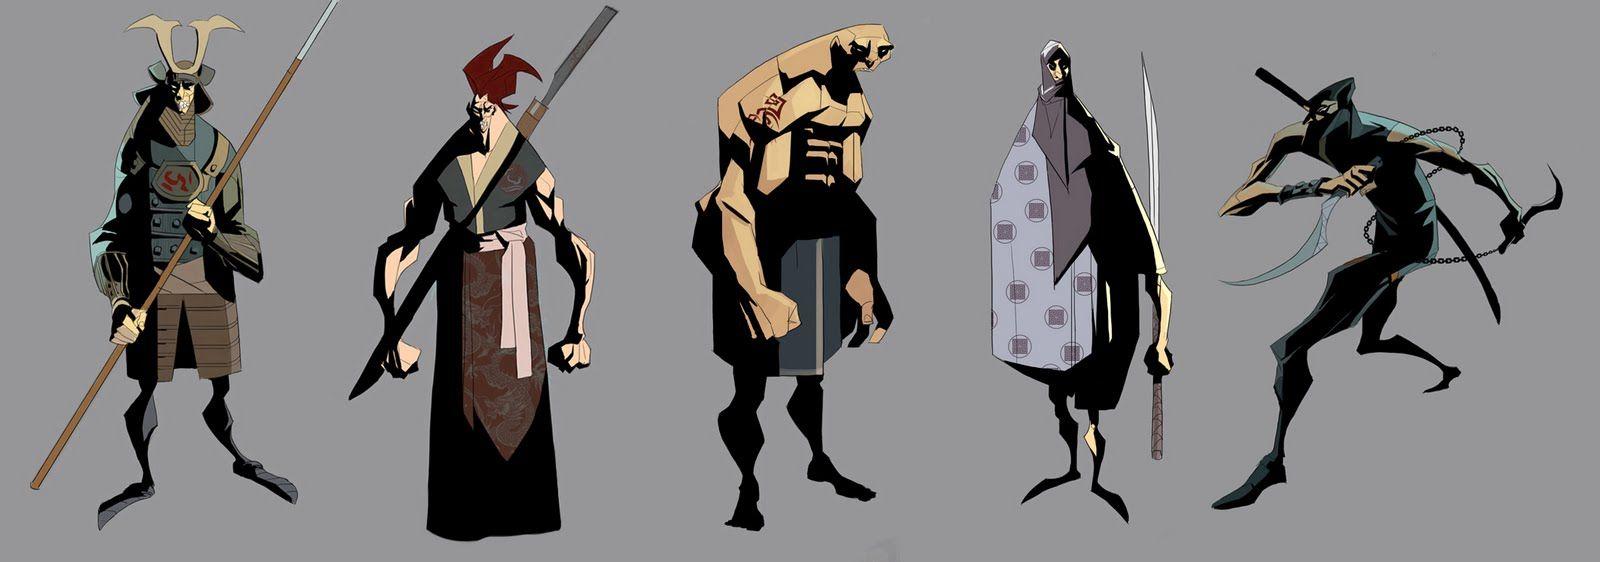 Eduard Visan characters